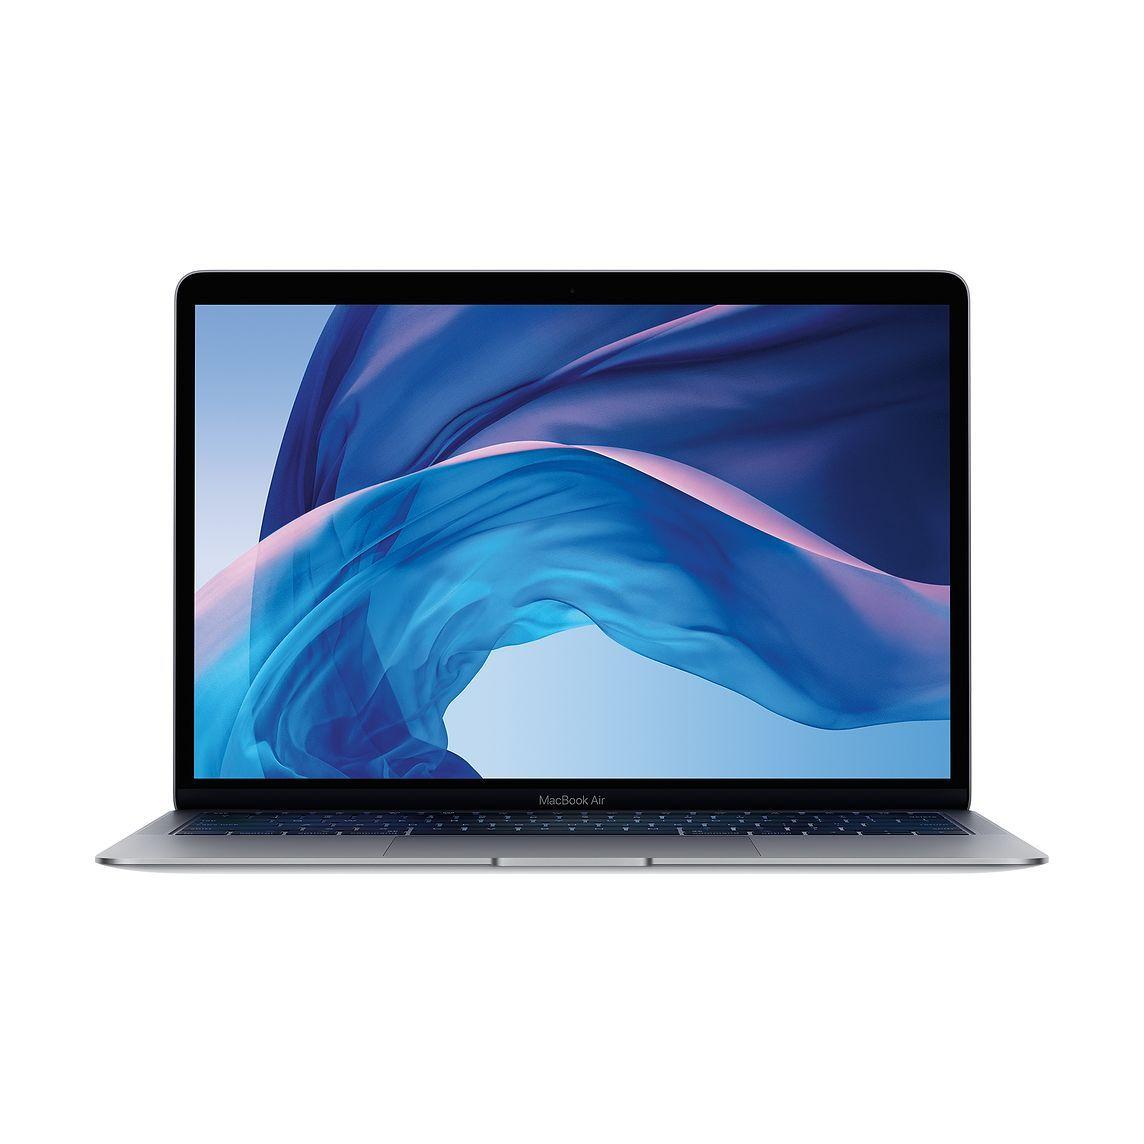 Refurbished 13 3 Inch Macbook Air 1 6ghz Dual Core Intel Core I5 With Retina Display And True Tone Technolo In 2020 Apple Macbook Air Macbook Air 13 Inch Apple Macbook